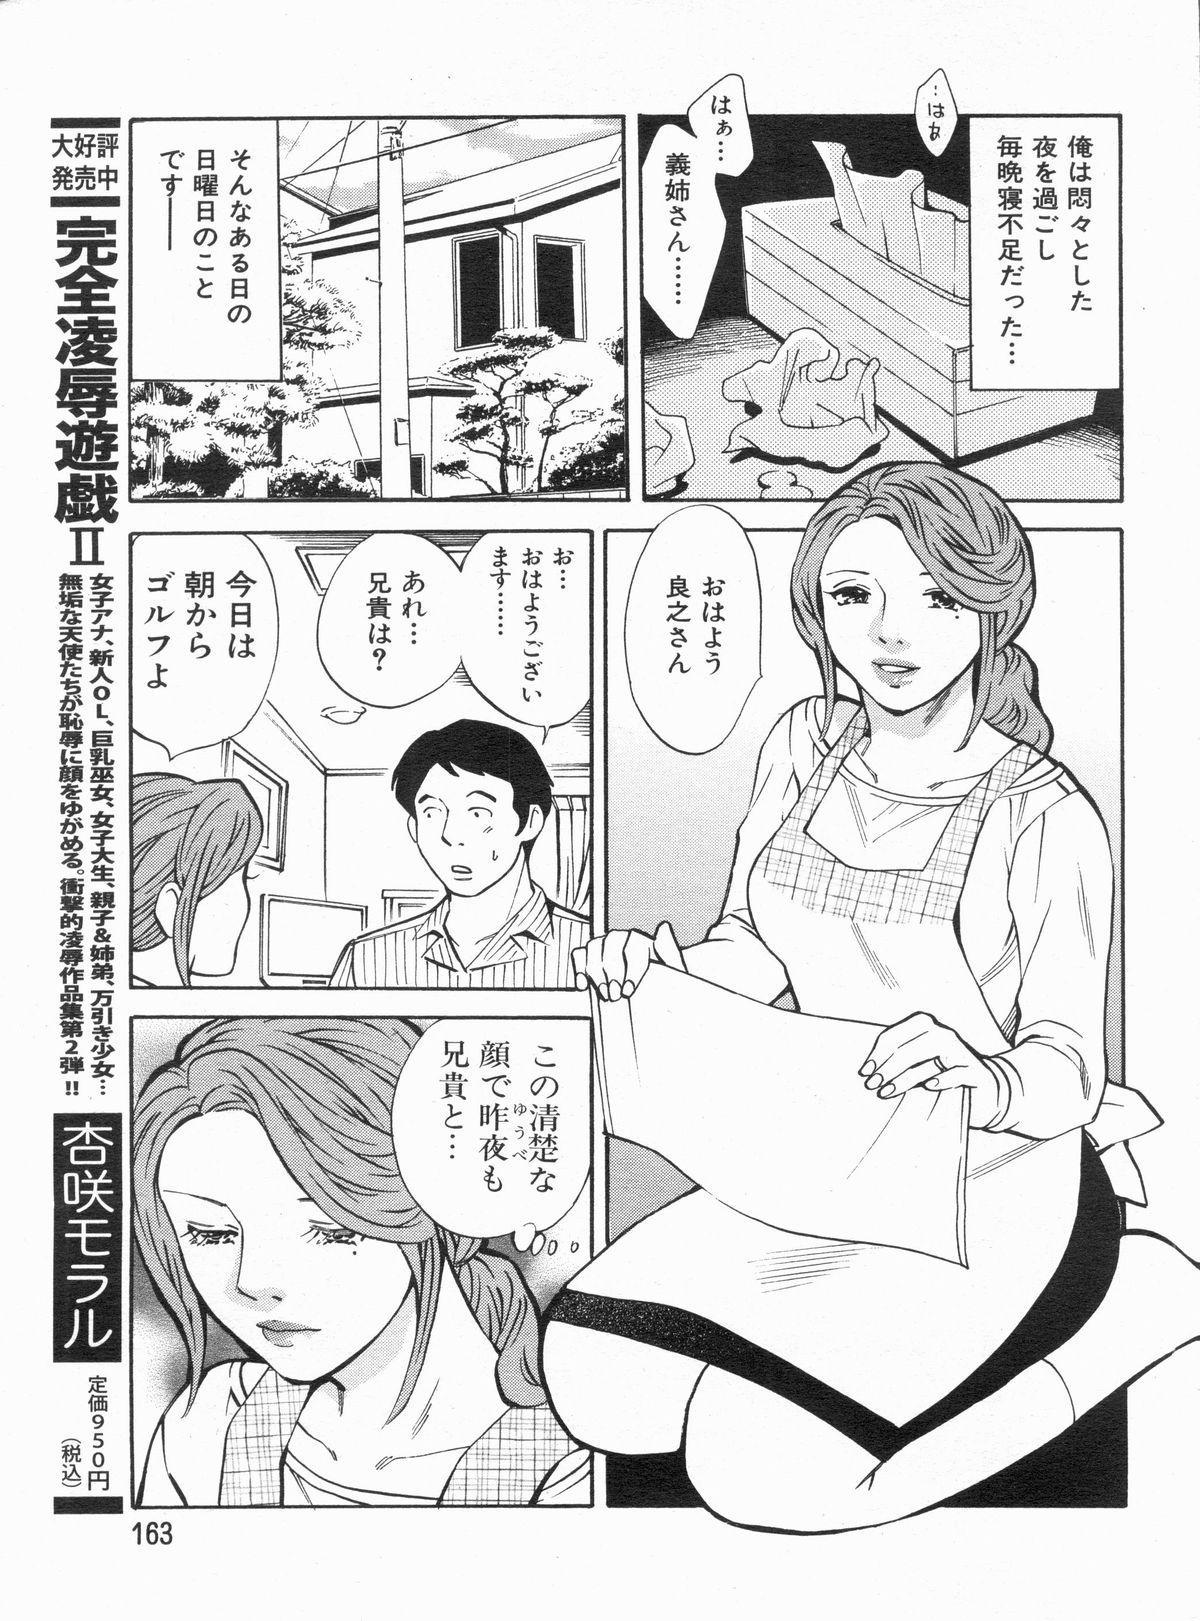 Manga Bon 2013-03 161